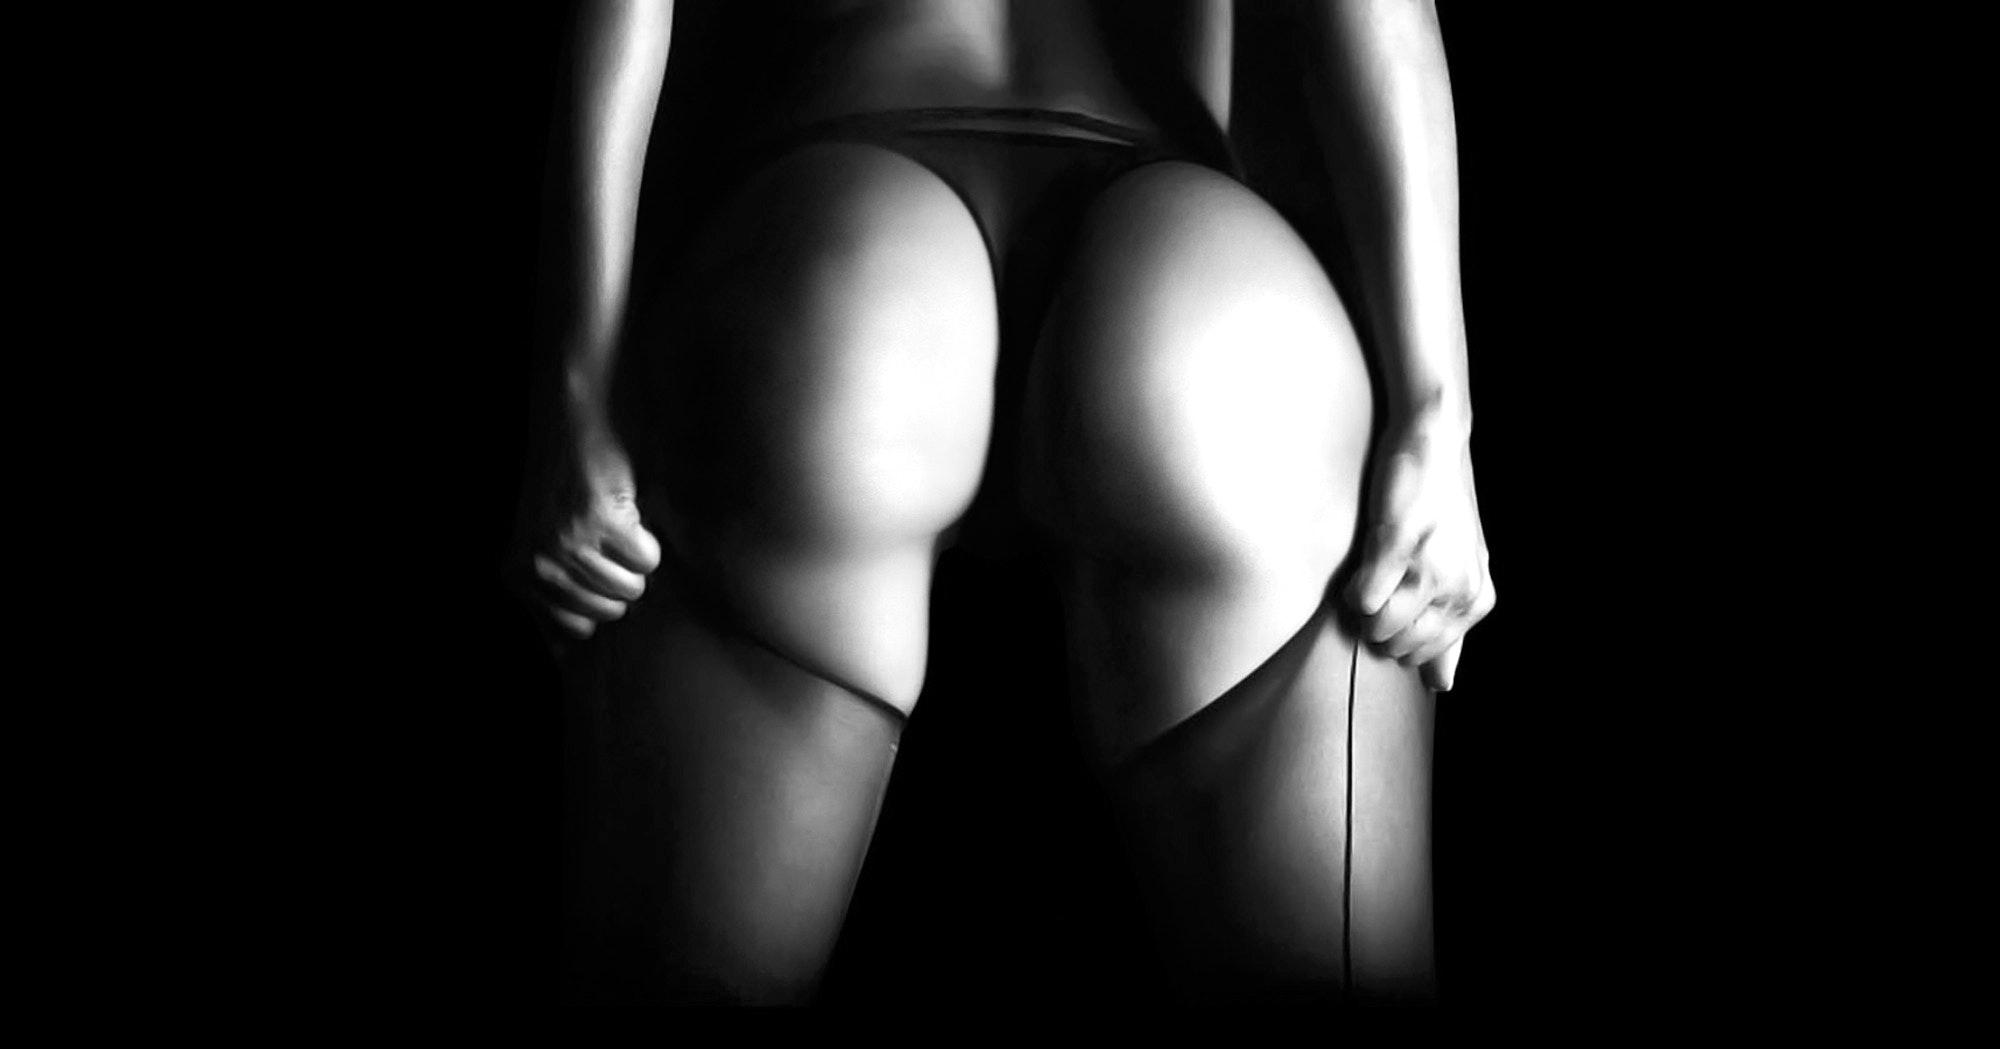 Erotic pictures download